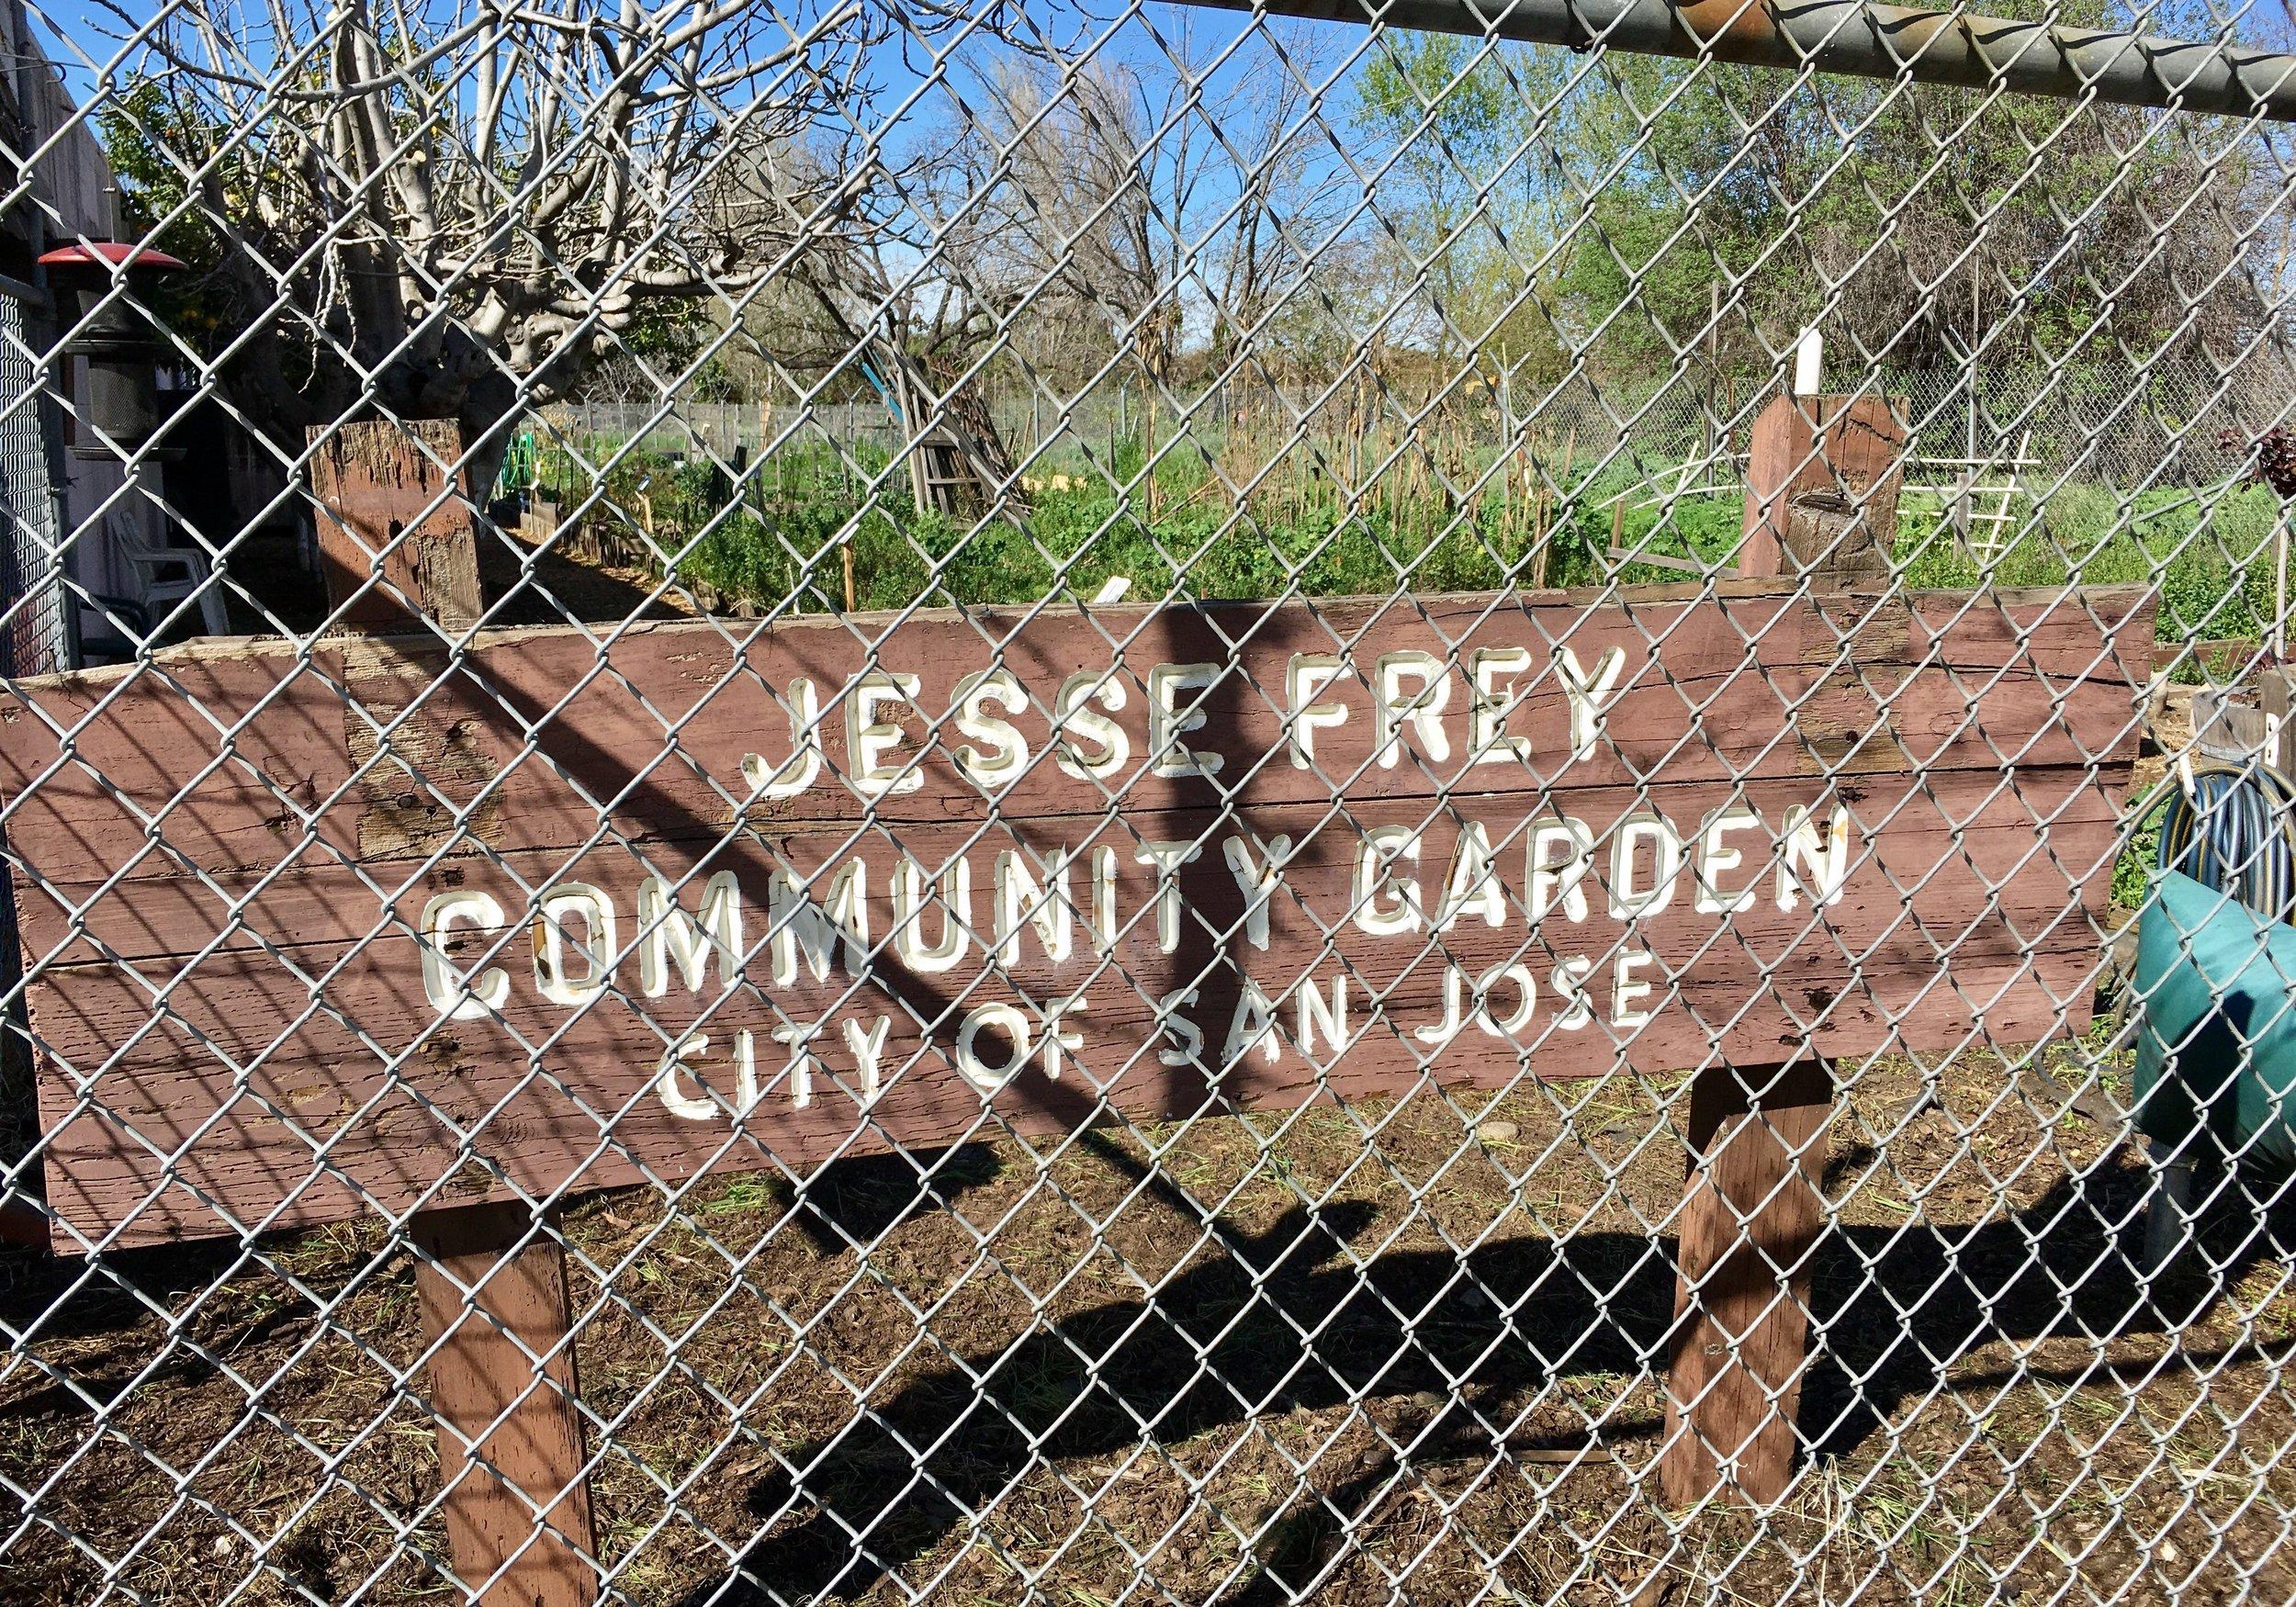 Jesse Frey Community Garden   W. Alma Ave & Belmont Way  San Jose, CA 95125   Información Adicional